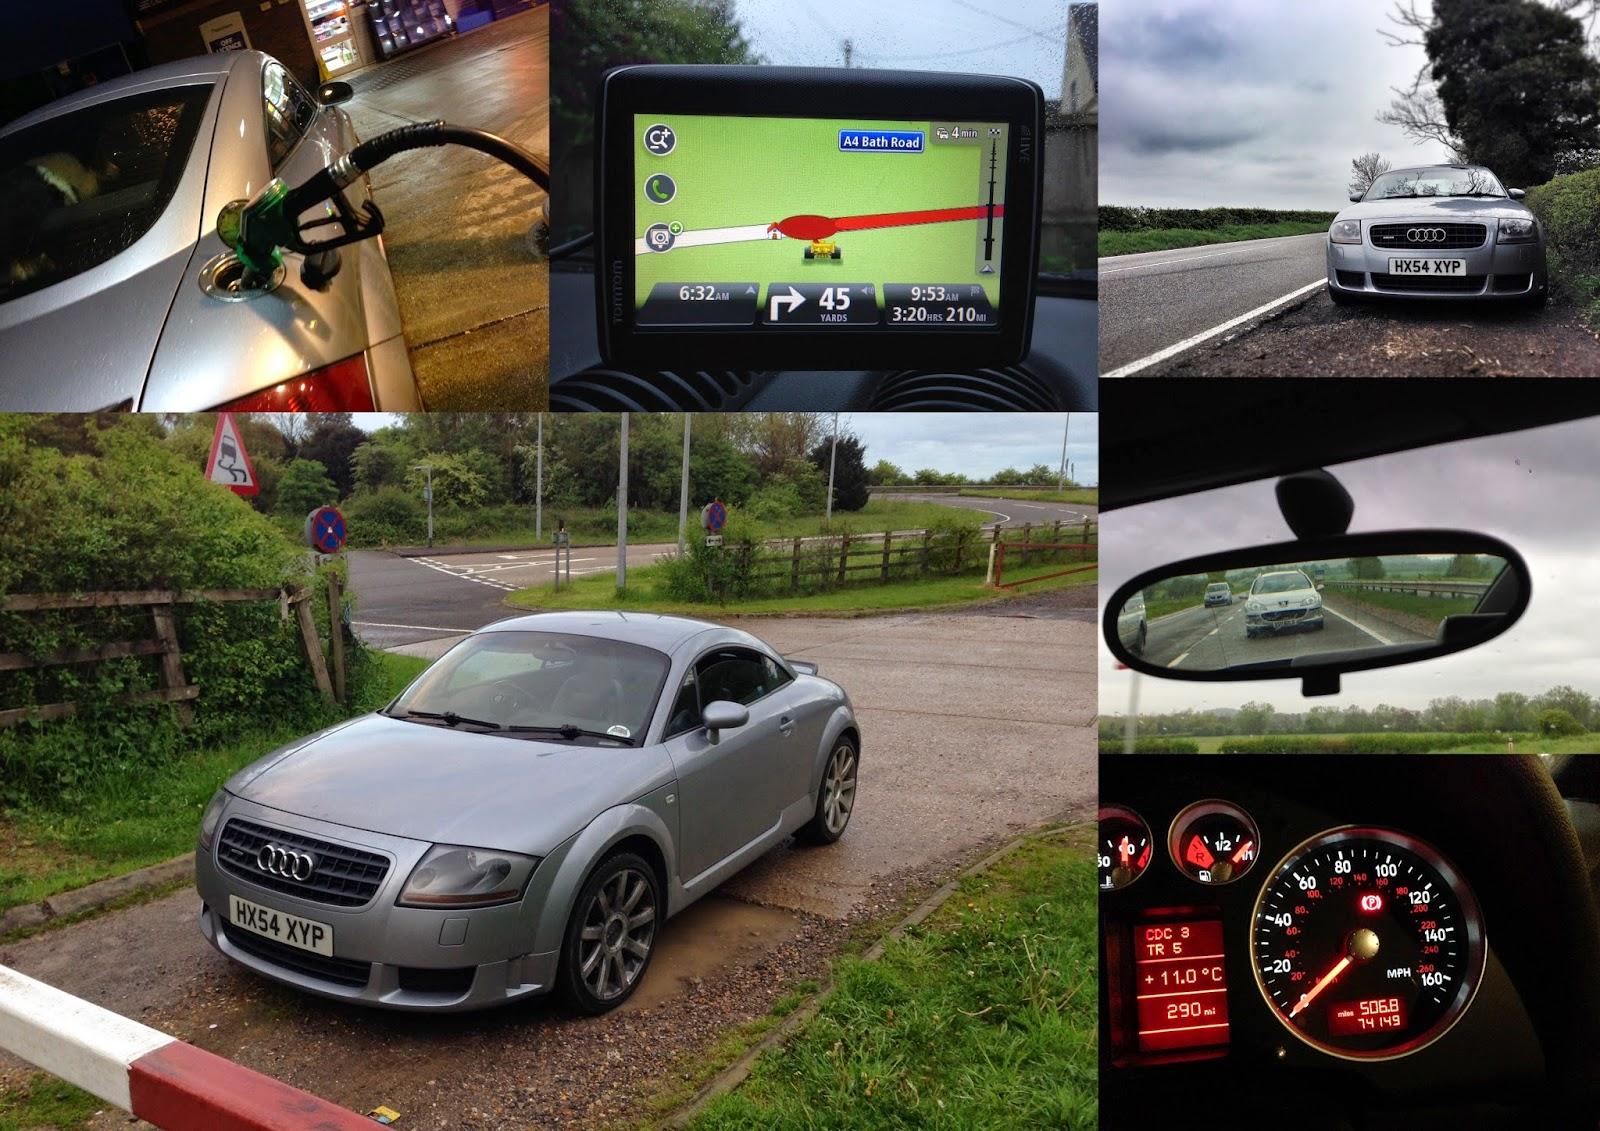 Audi TT 3.2 V6 road trip